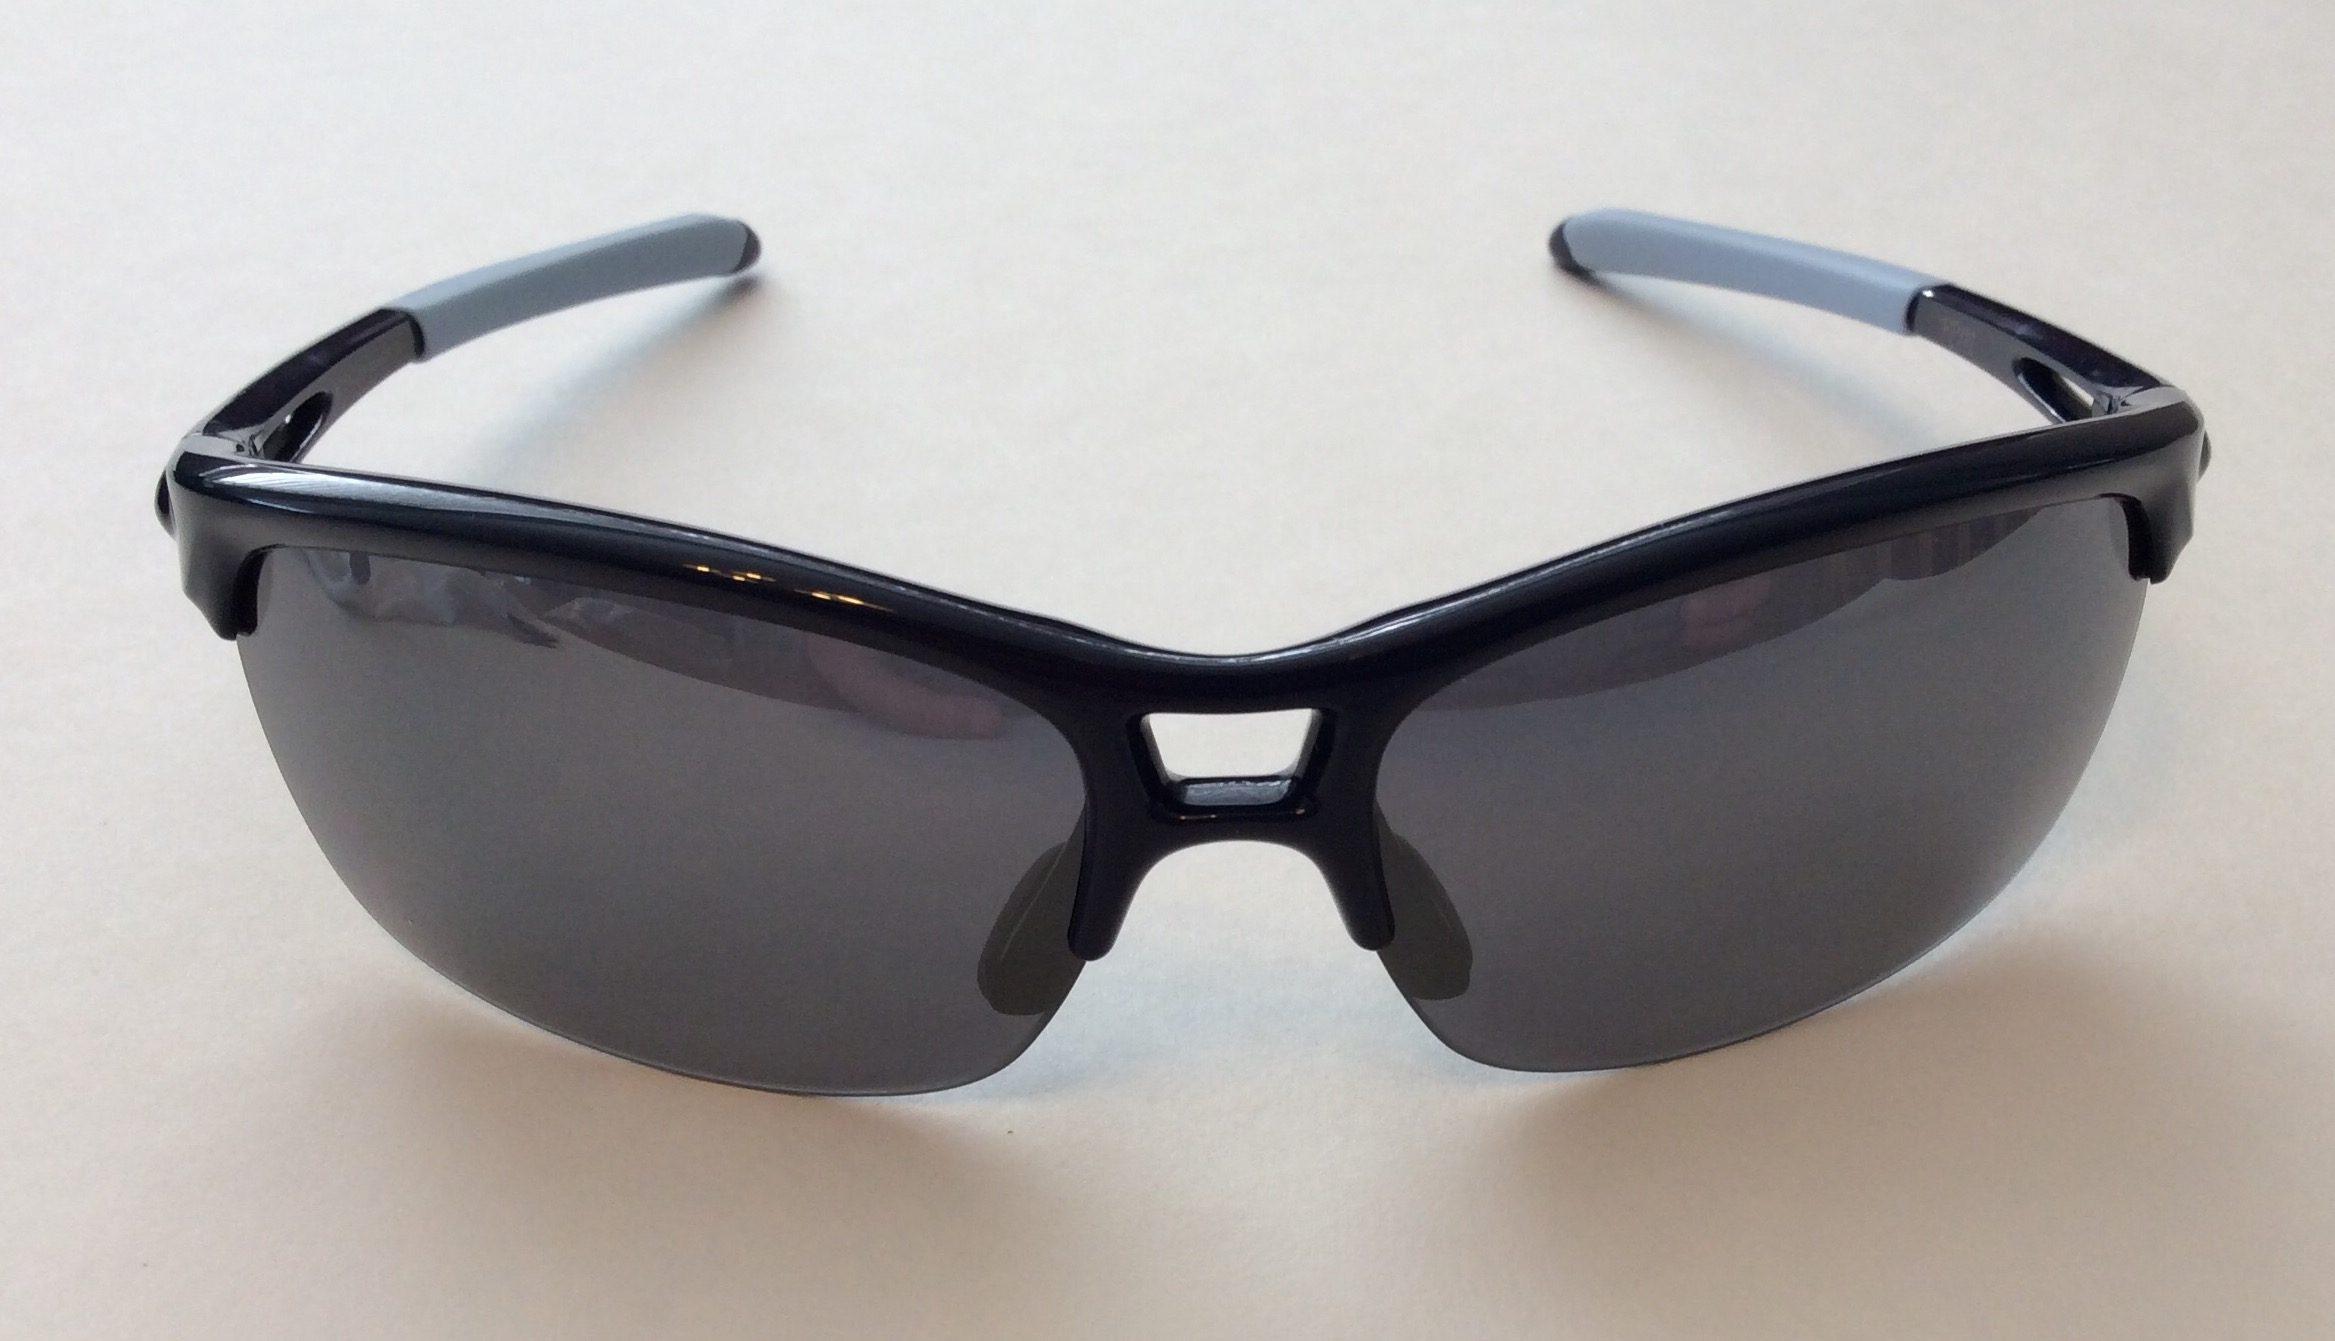 089ab9cfb6 Oakley RPM Squared Sunglasses - Navy Blue Frame - Black Iridium - OO9205-14